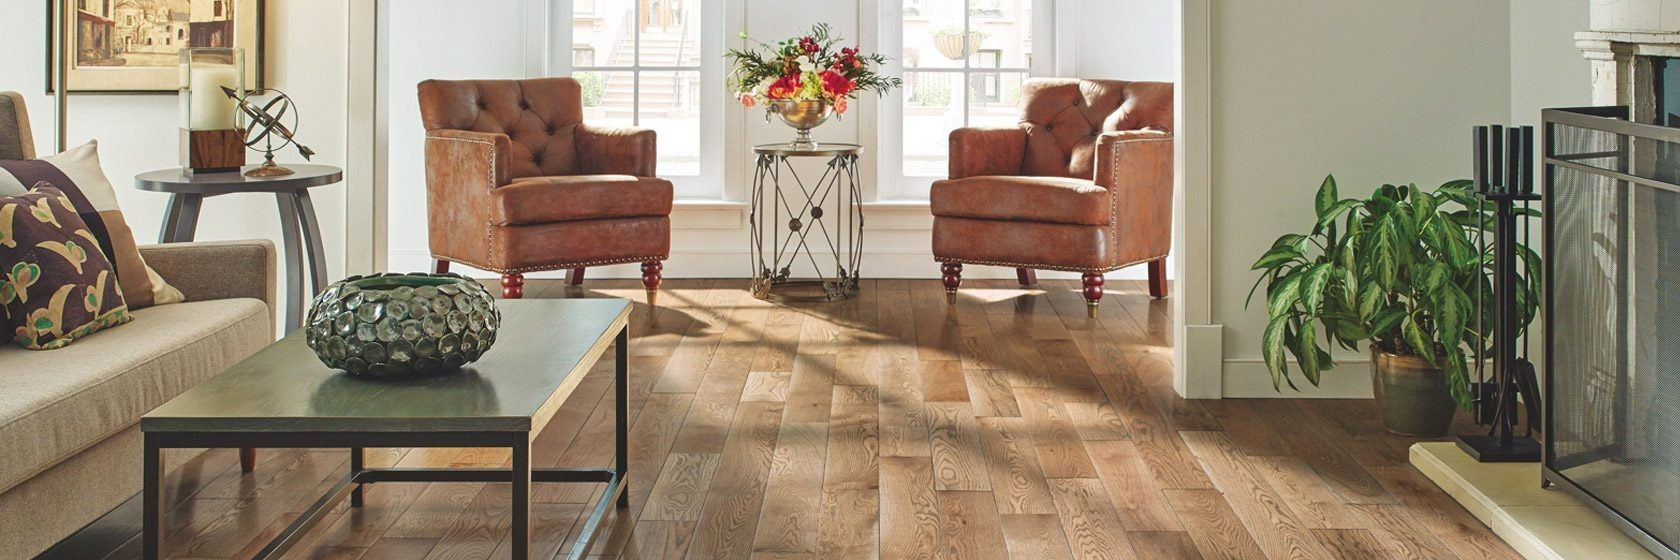 vintage white oak hardwood flooring of 19 best of hardwood floor tile stock dizpos com regarding hardwood floor tile best of oak solid hardwood hay ground saktb39l4hgw is part of the pics